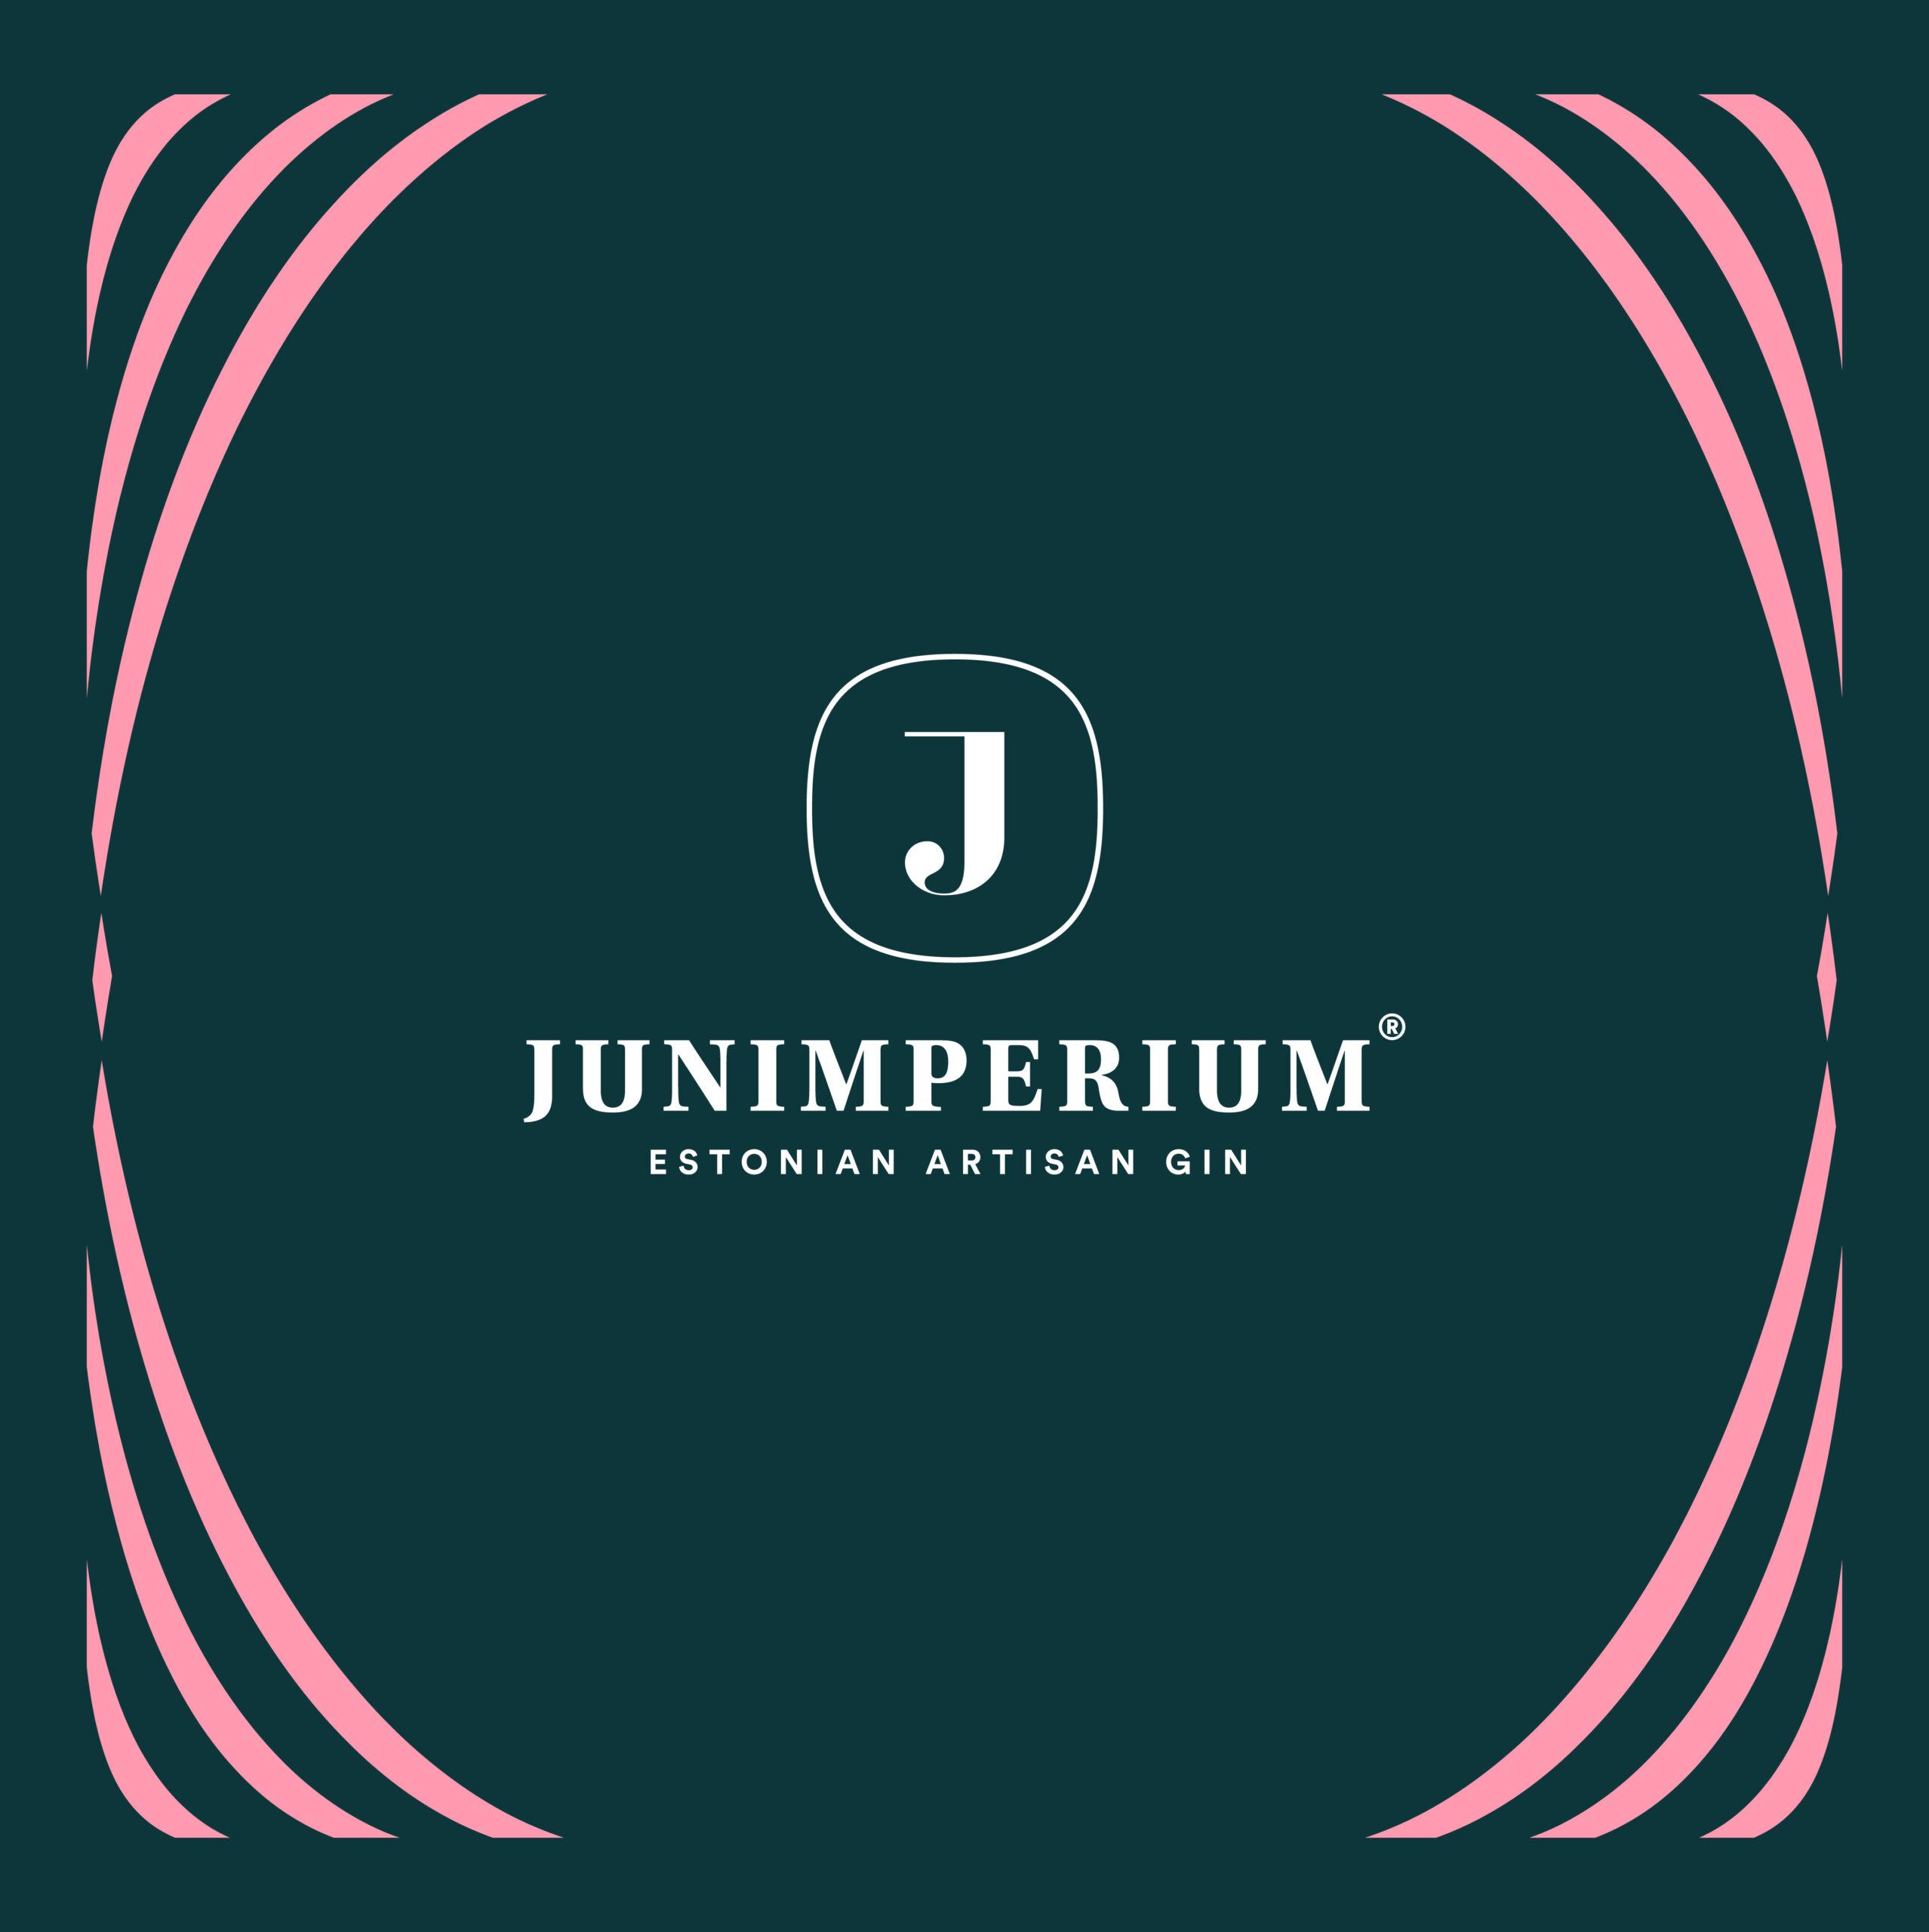 junimperium_TlnCW_Sponsorid_IG